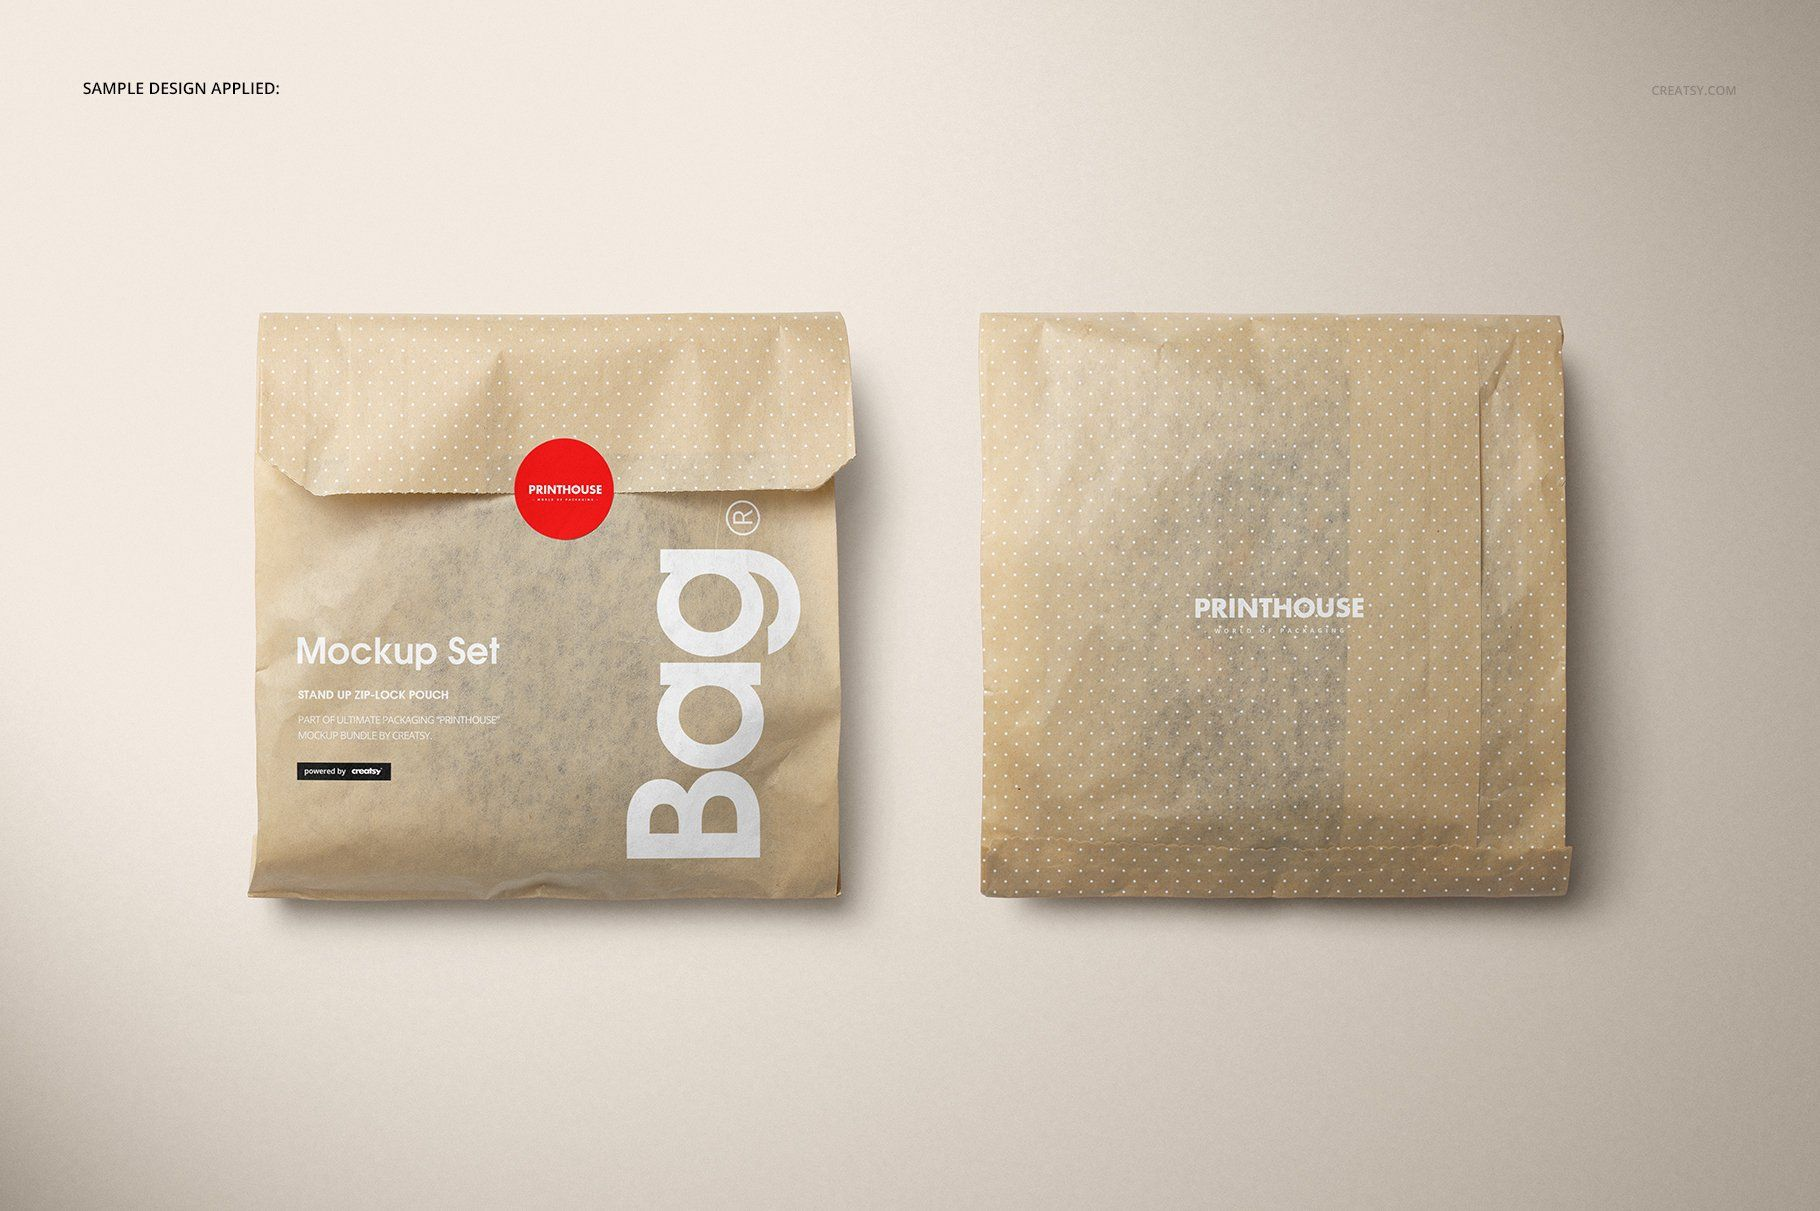 Download Sandwich Snack Paper Bag Mockup Set Bag Mockup Kraft Packaging Brown Paper Packages